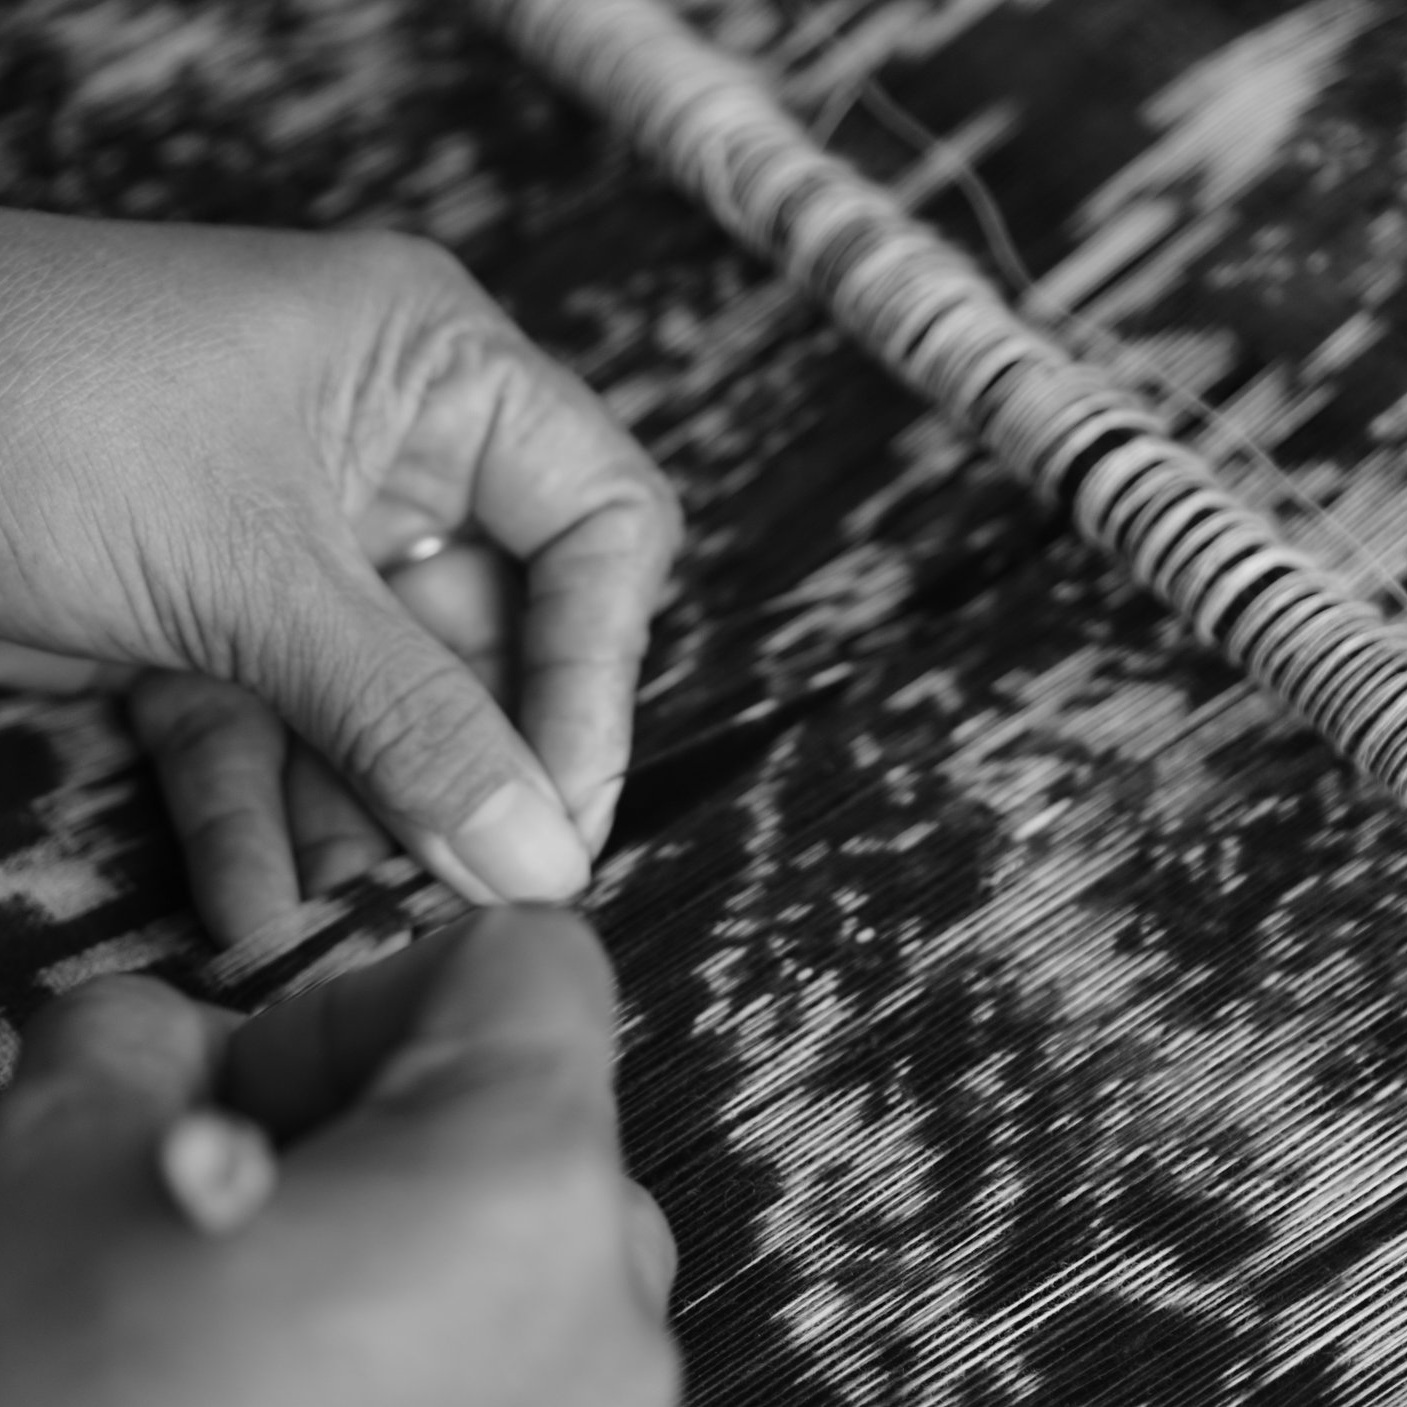 Weaving - Weaving Demos with Debbie Turner, Sandy Clark Kolaks and Katarina Koch